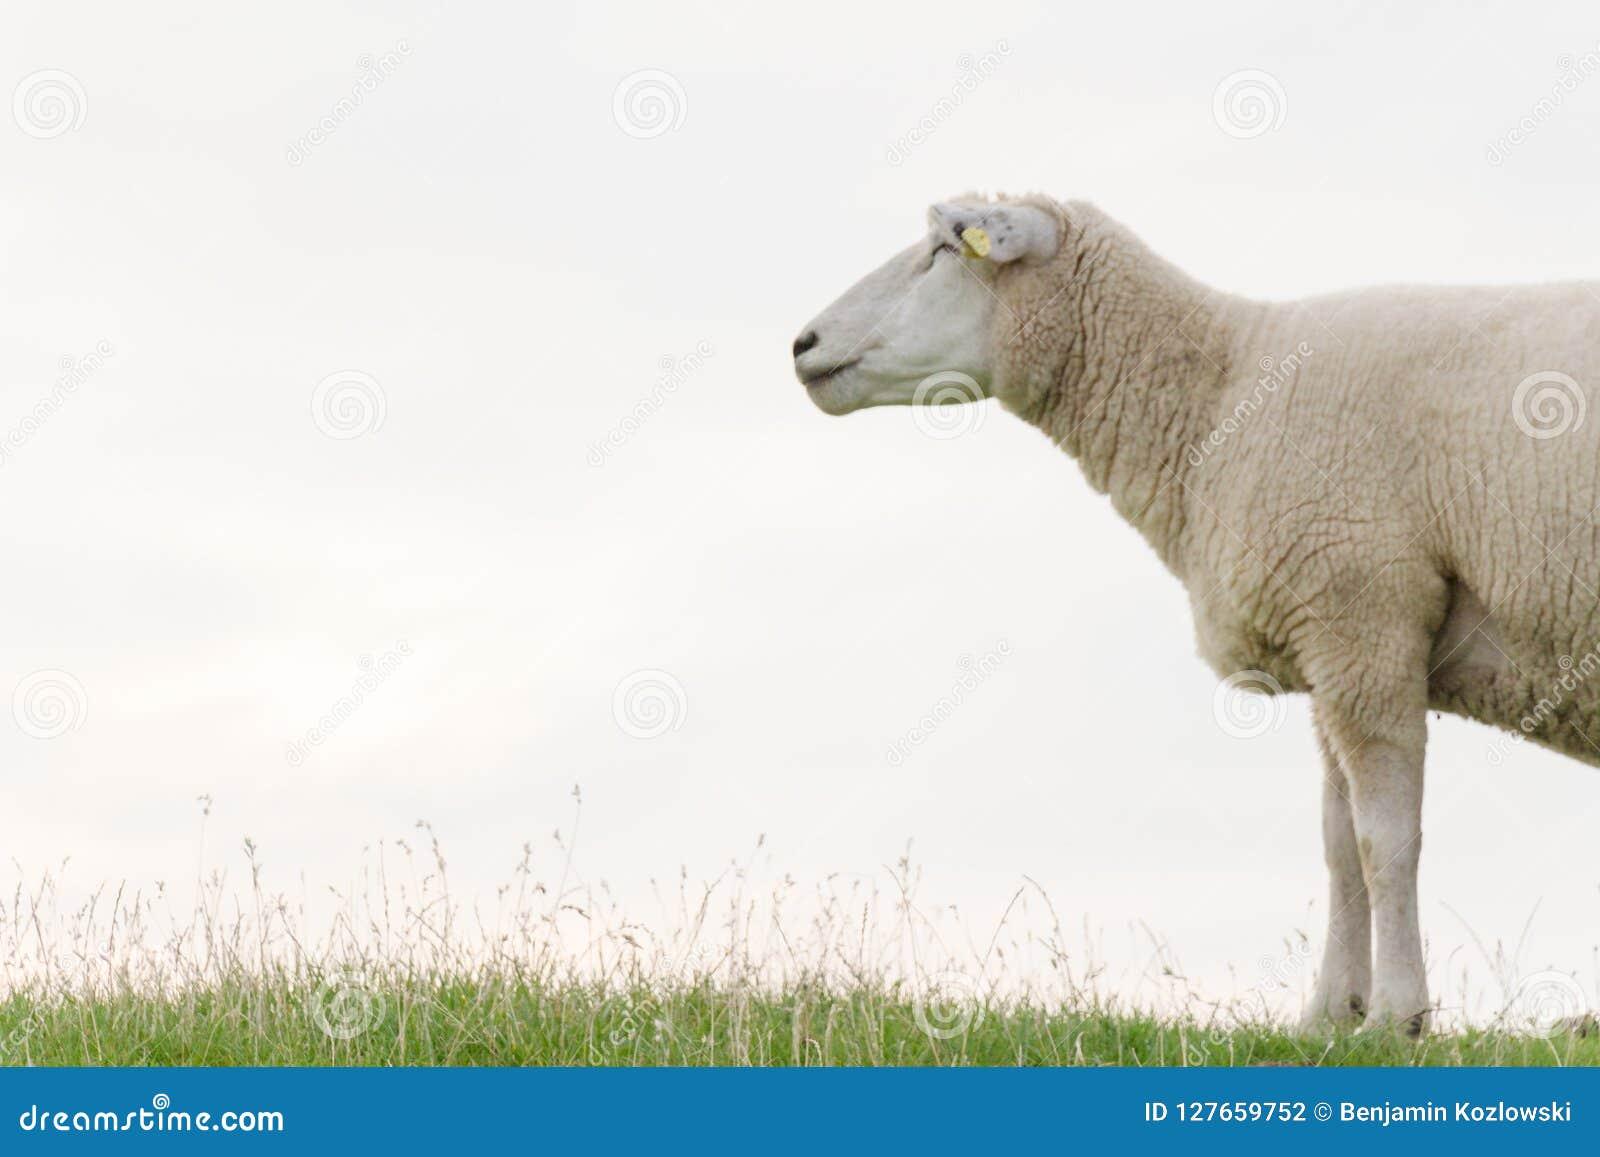 Fleecy sheep on a green